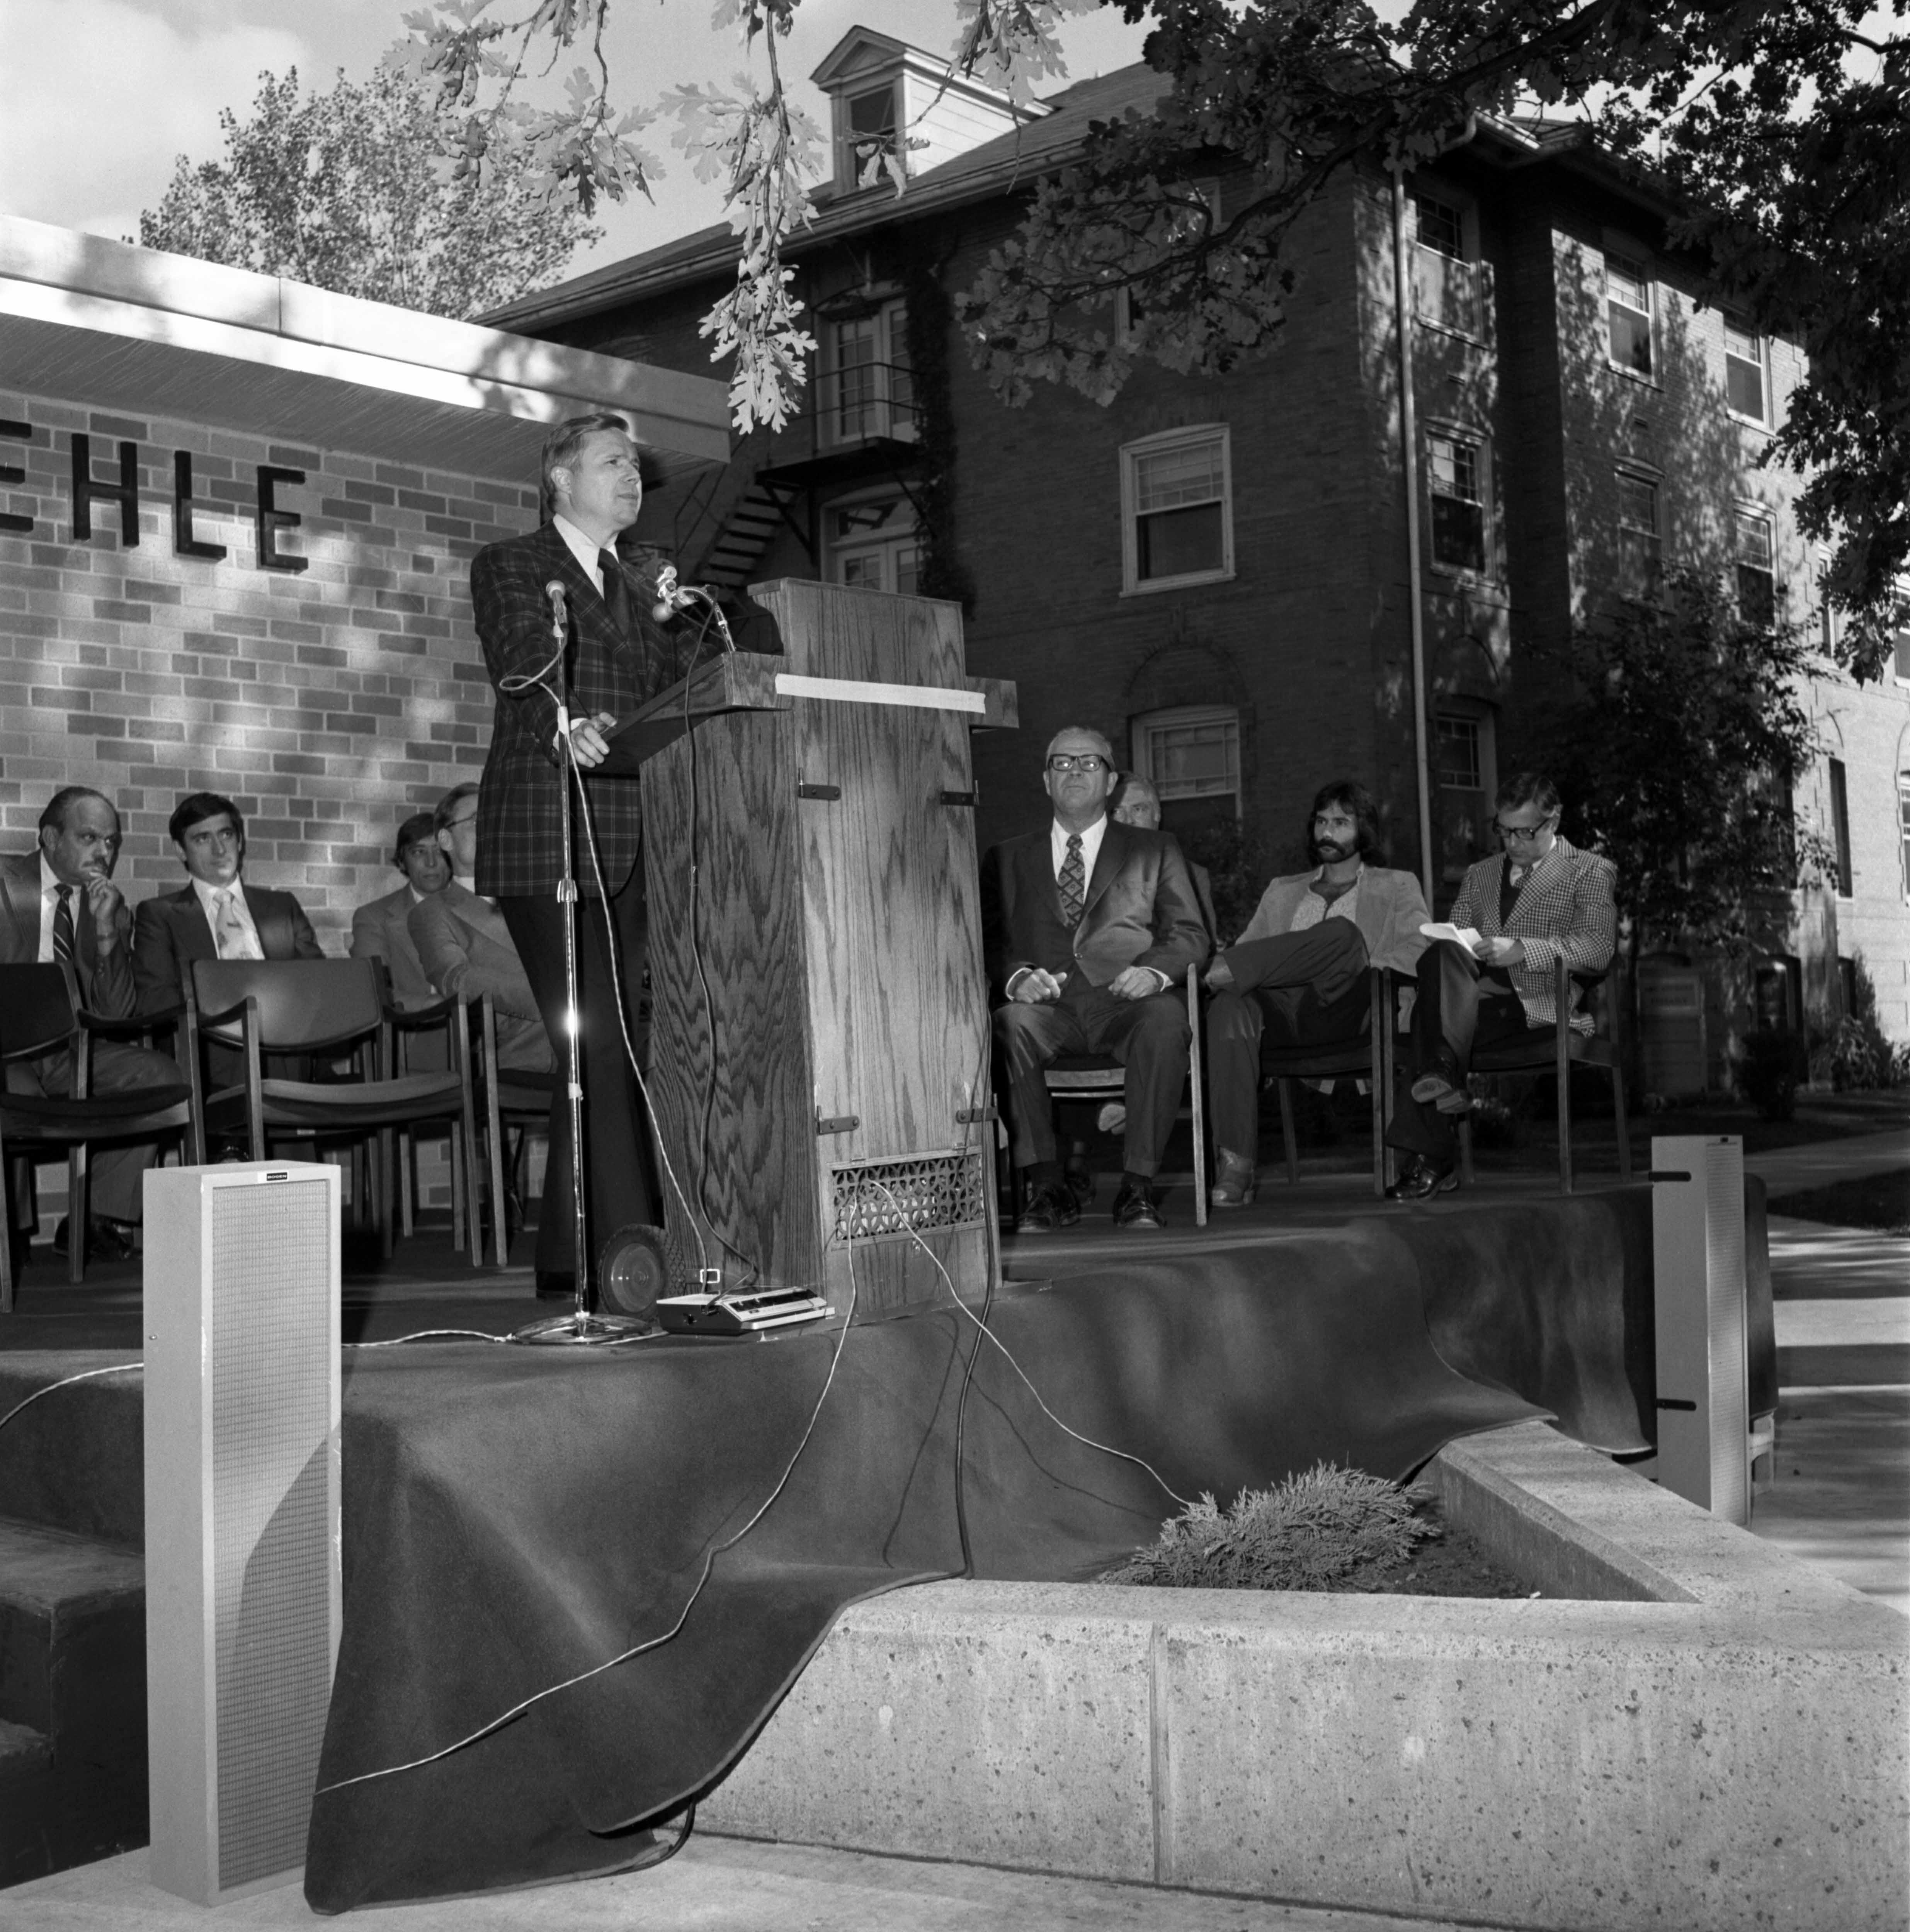 Charles Graham at the Kiehle rededication ceremony, September 1975